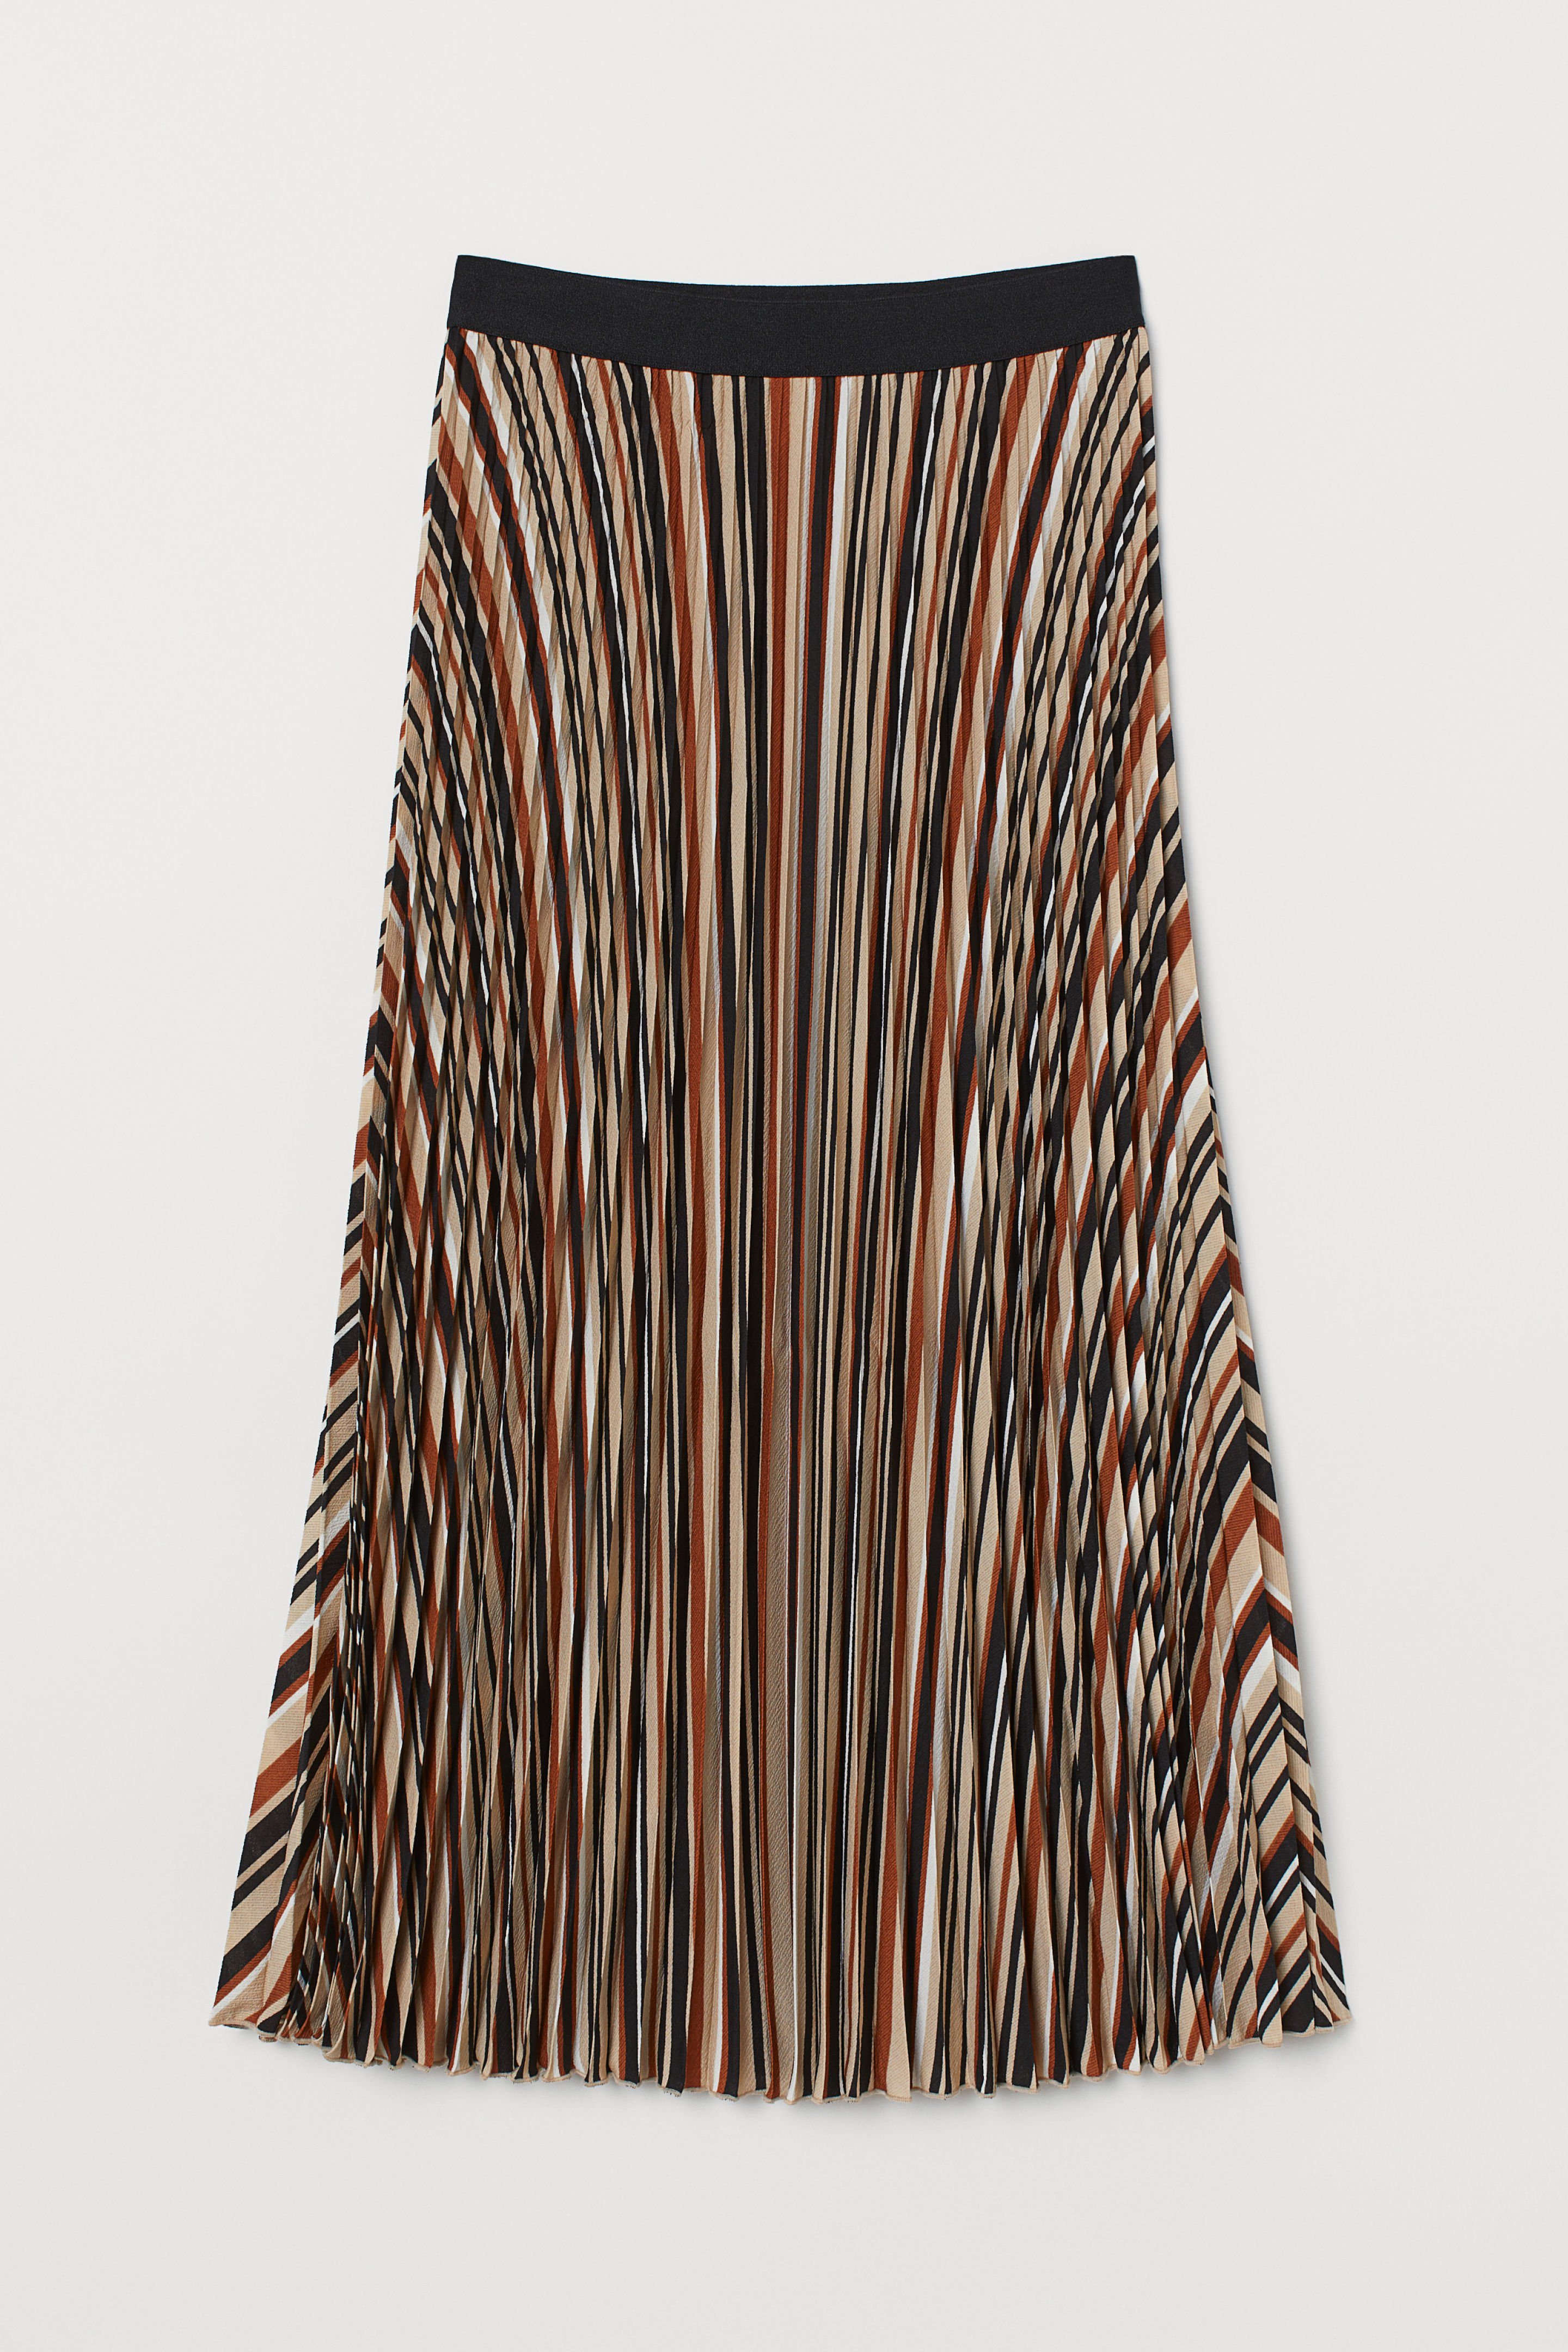 Pleated Skirt - Brown/striped - Ladies | H&M US